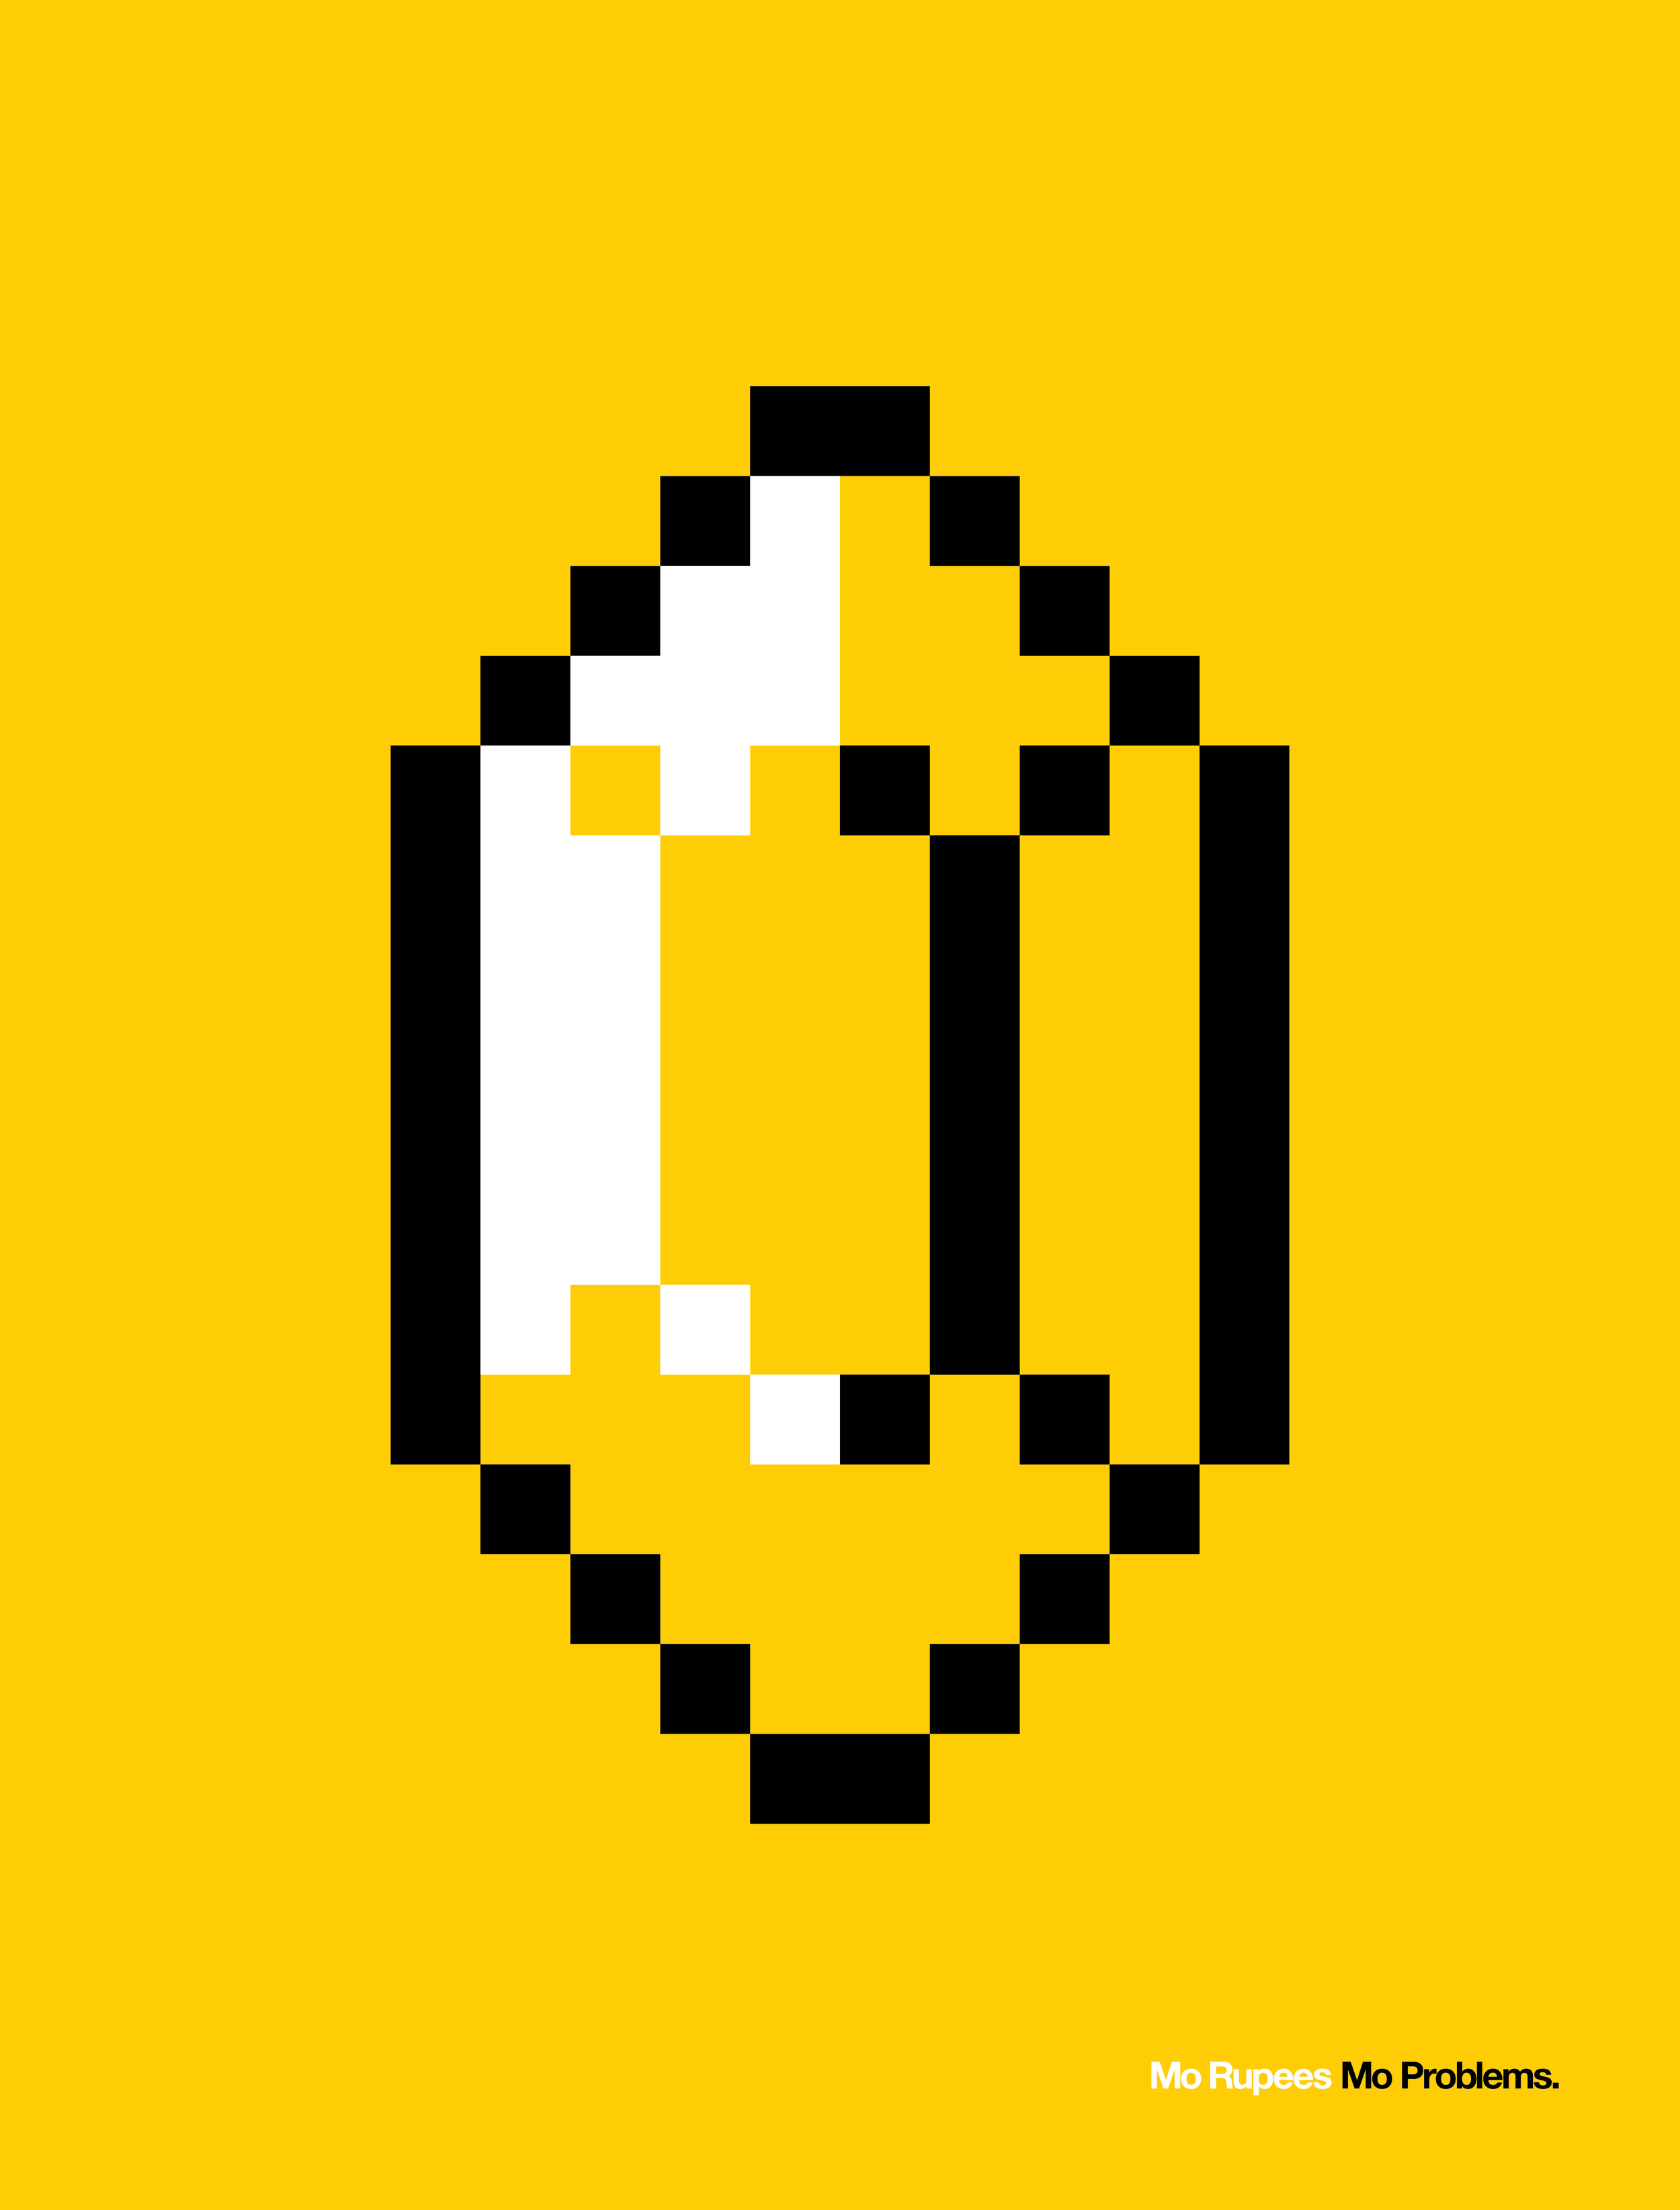 MoRupees yellow.jpg